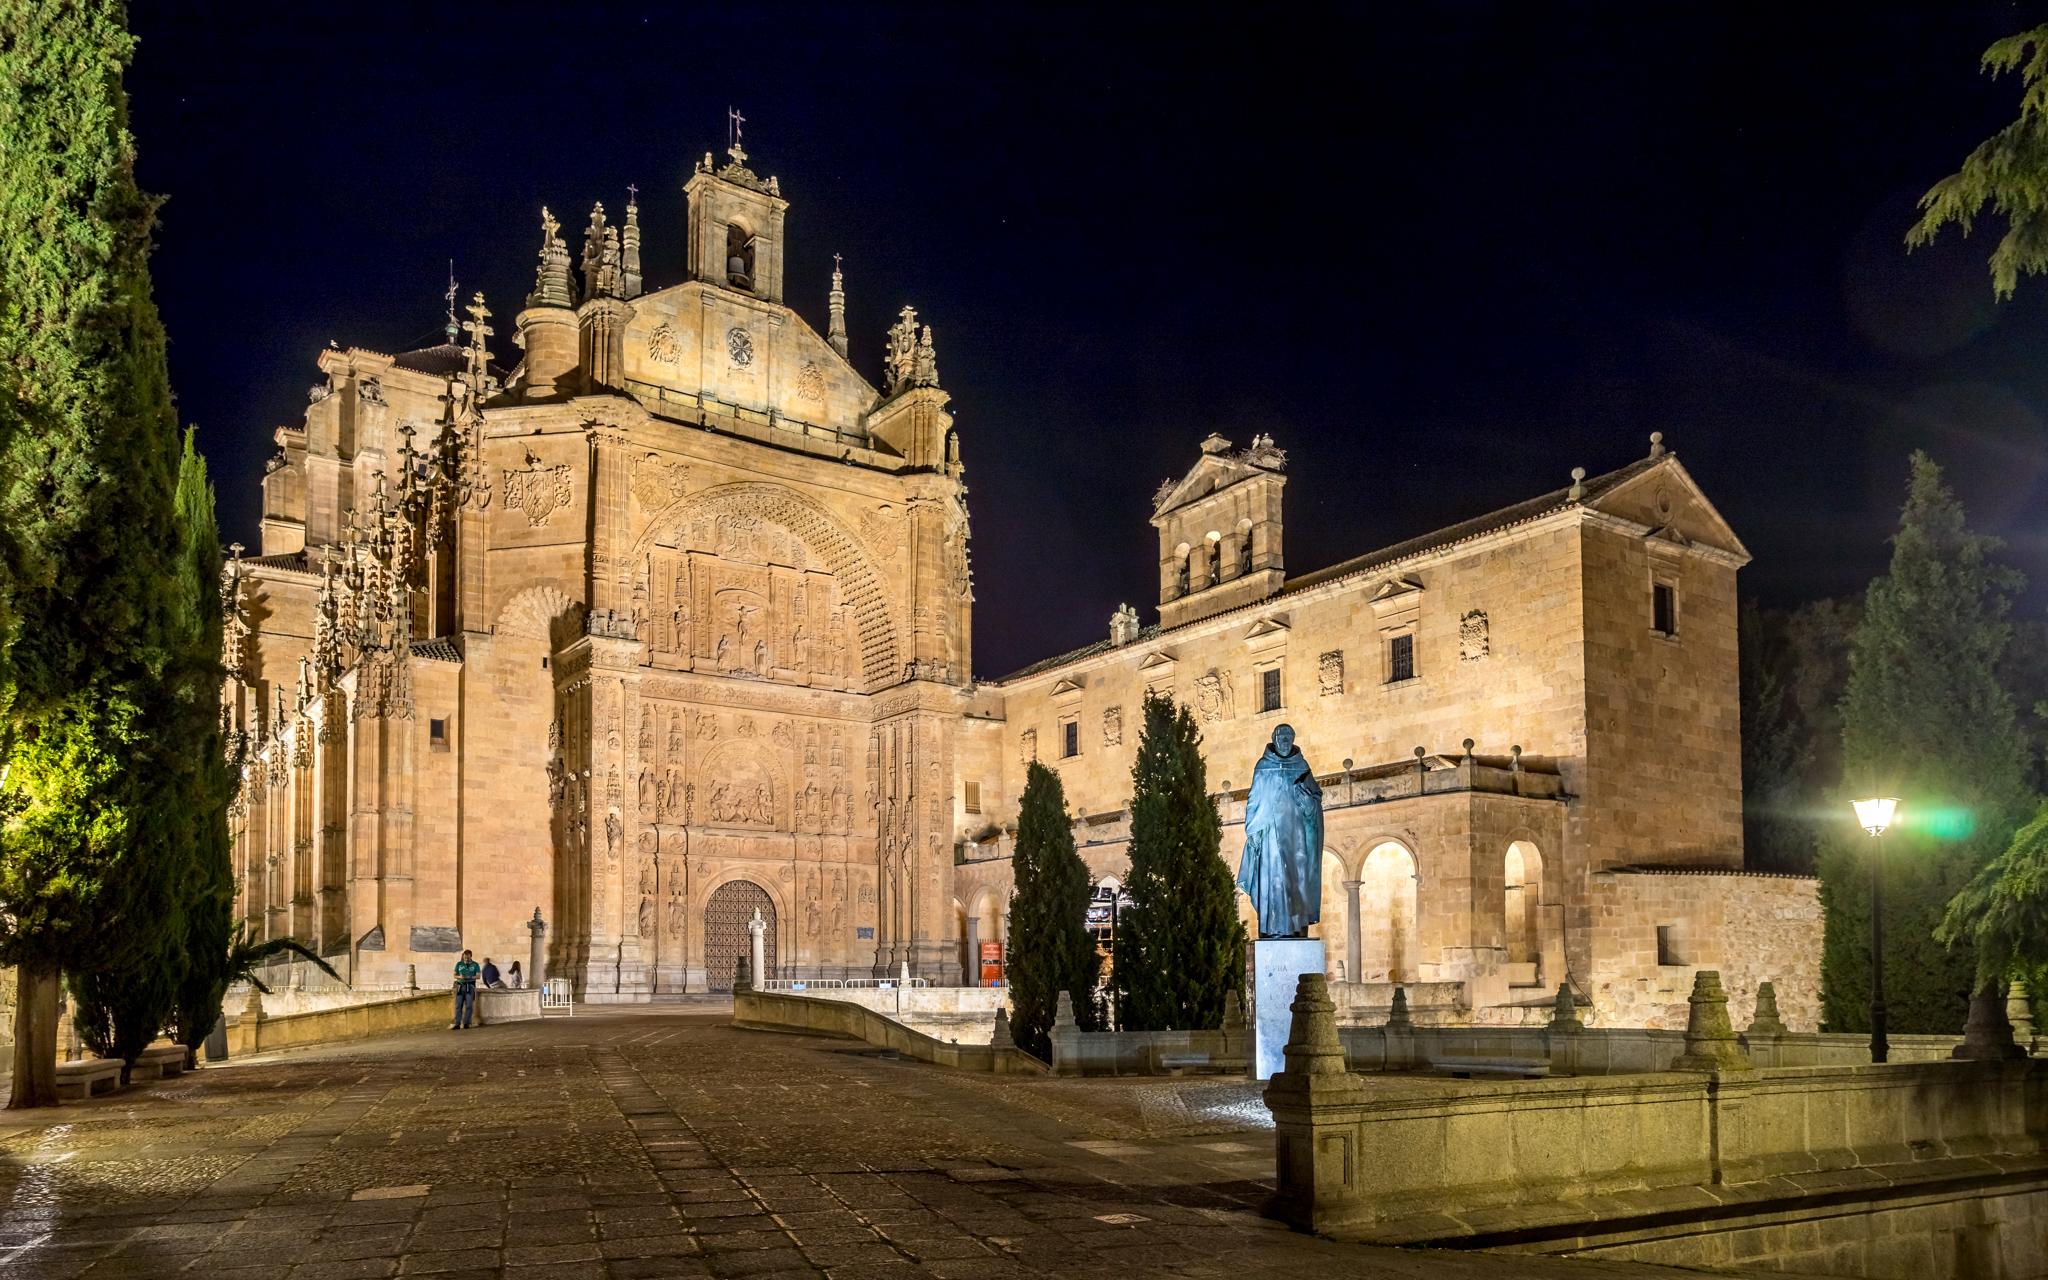 Convent of St. Stephen, Salamanca, Spain, Spain